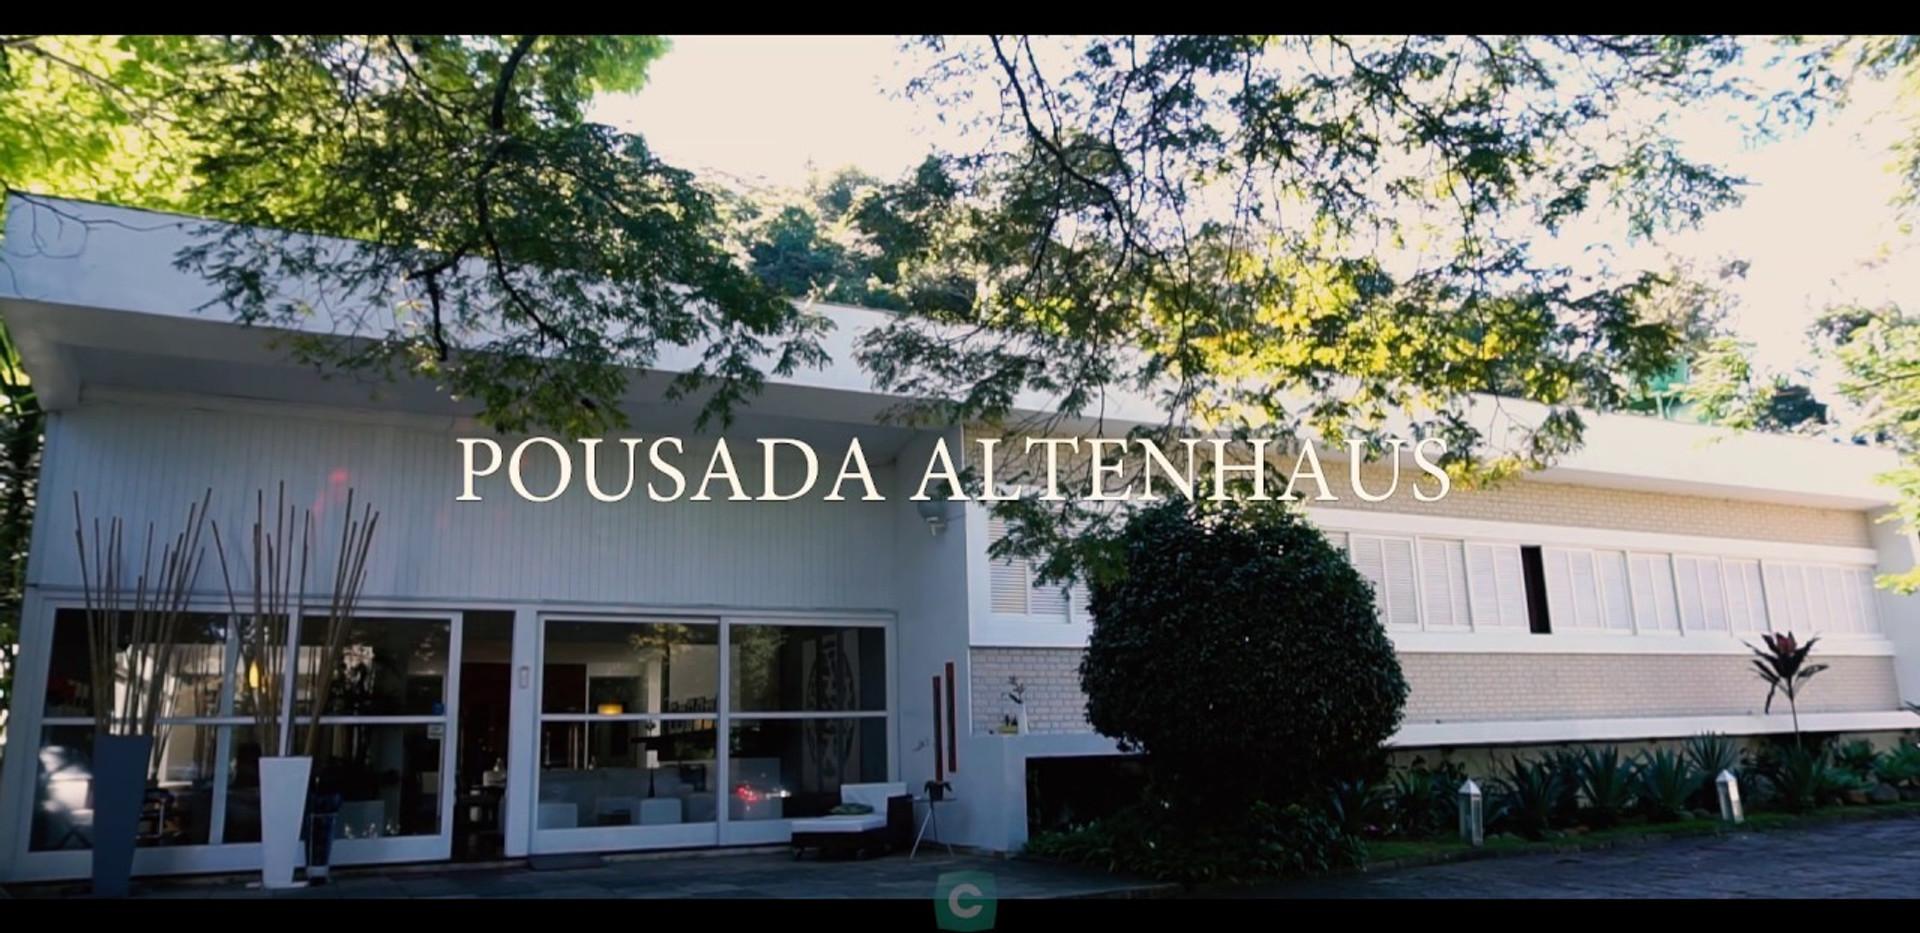 ALTENHAUS